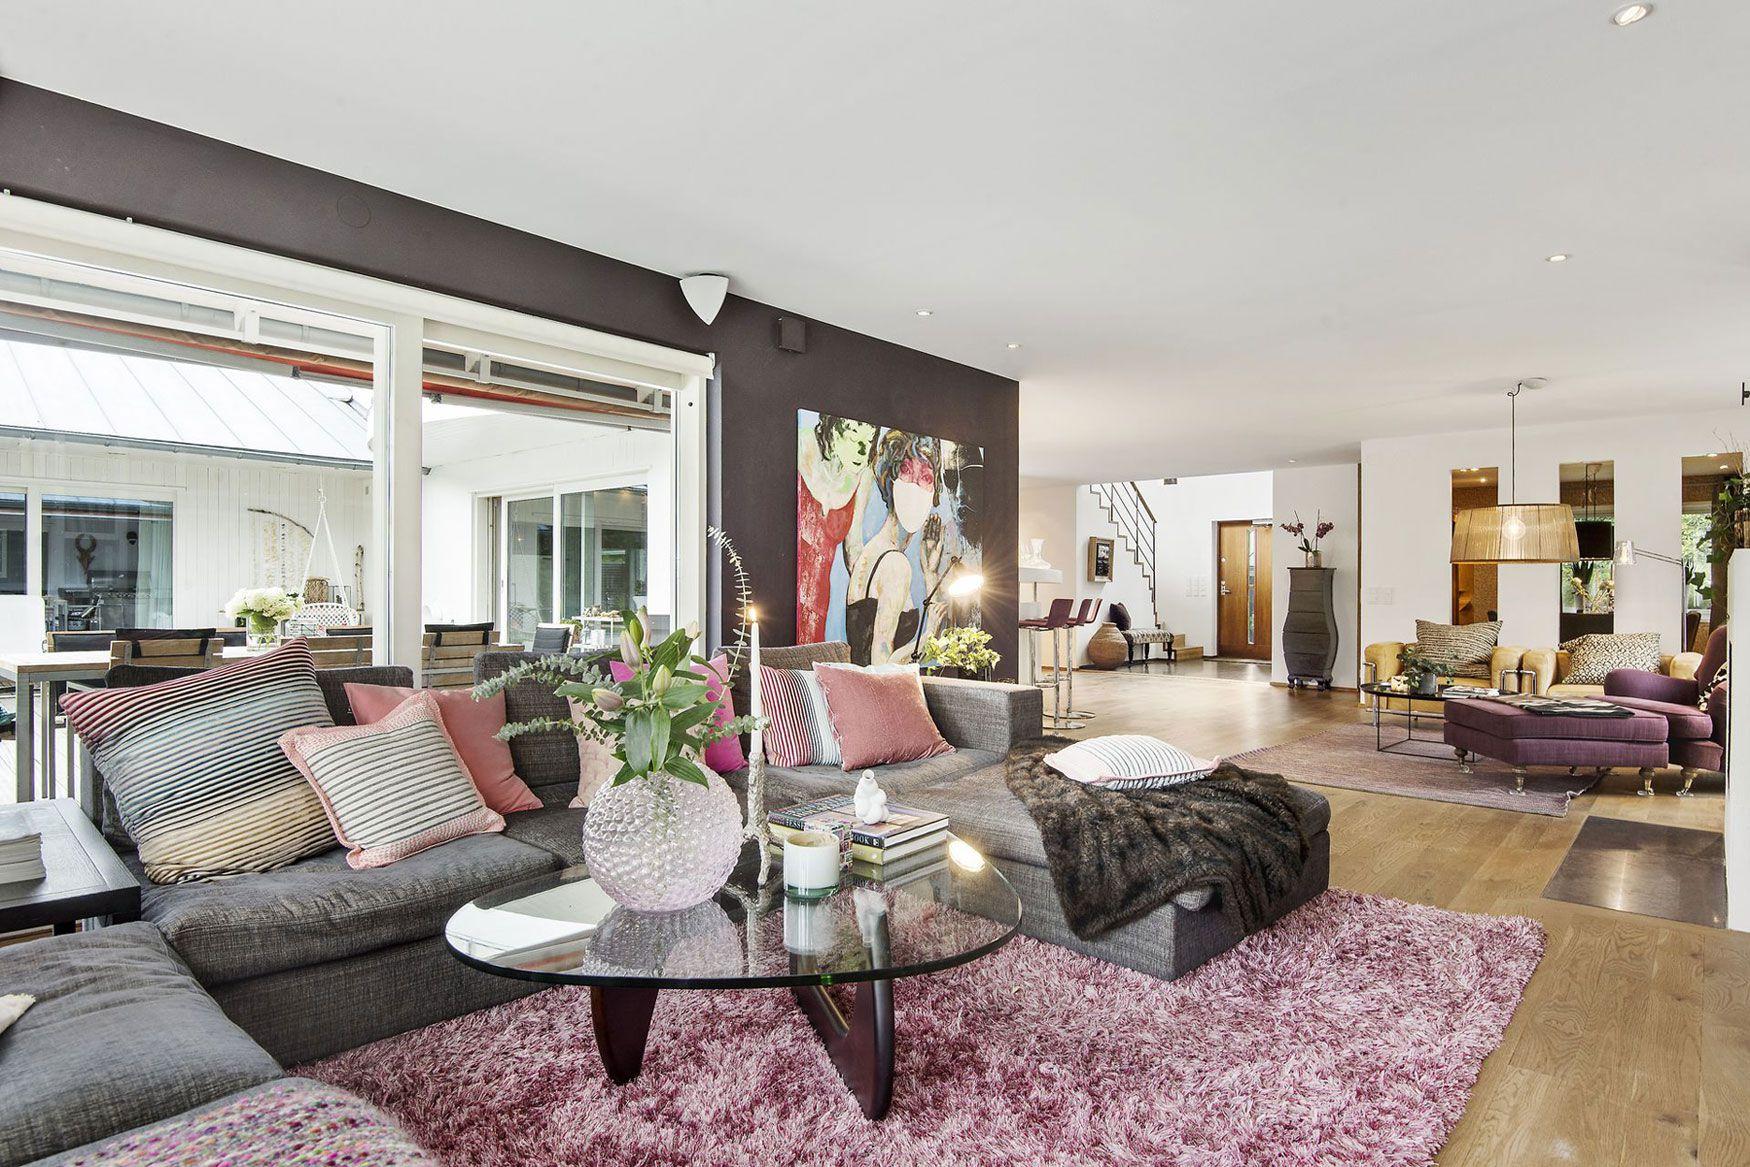 Stylish Home in Särö Sweden-23